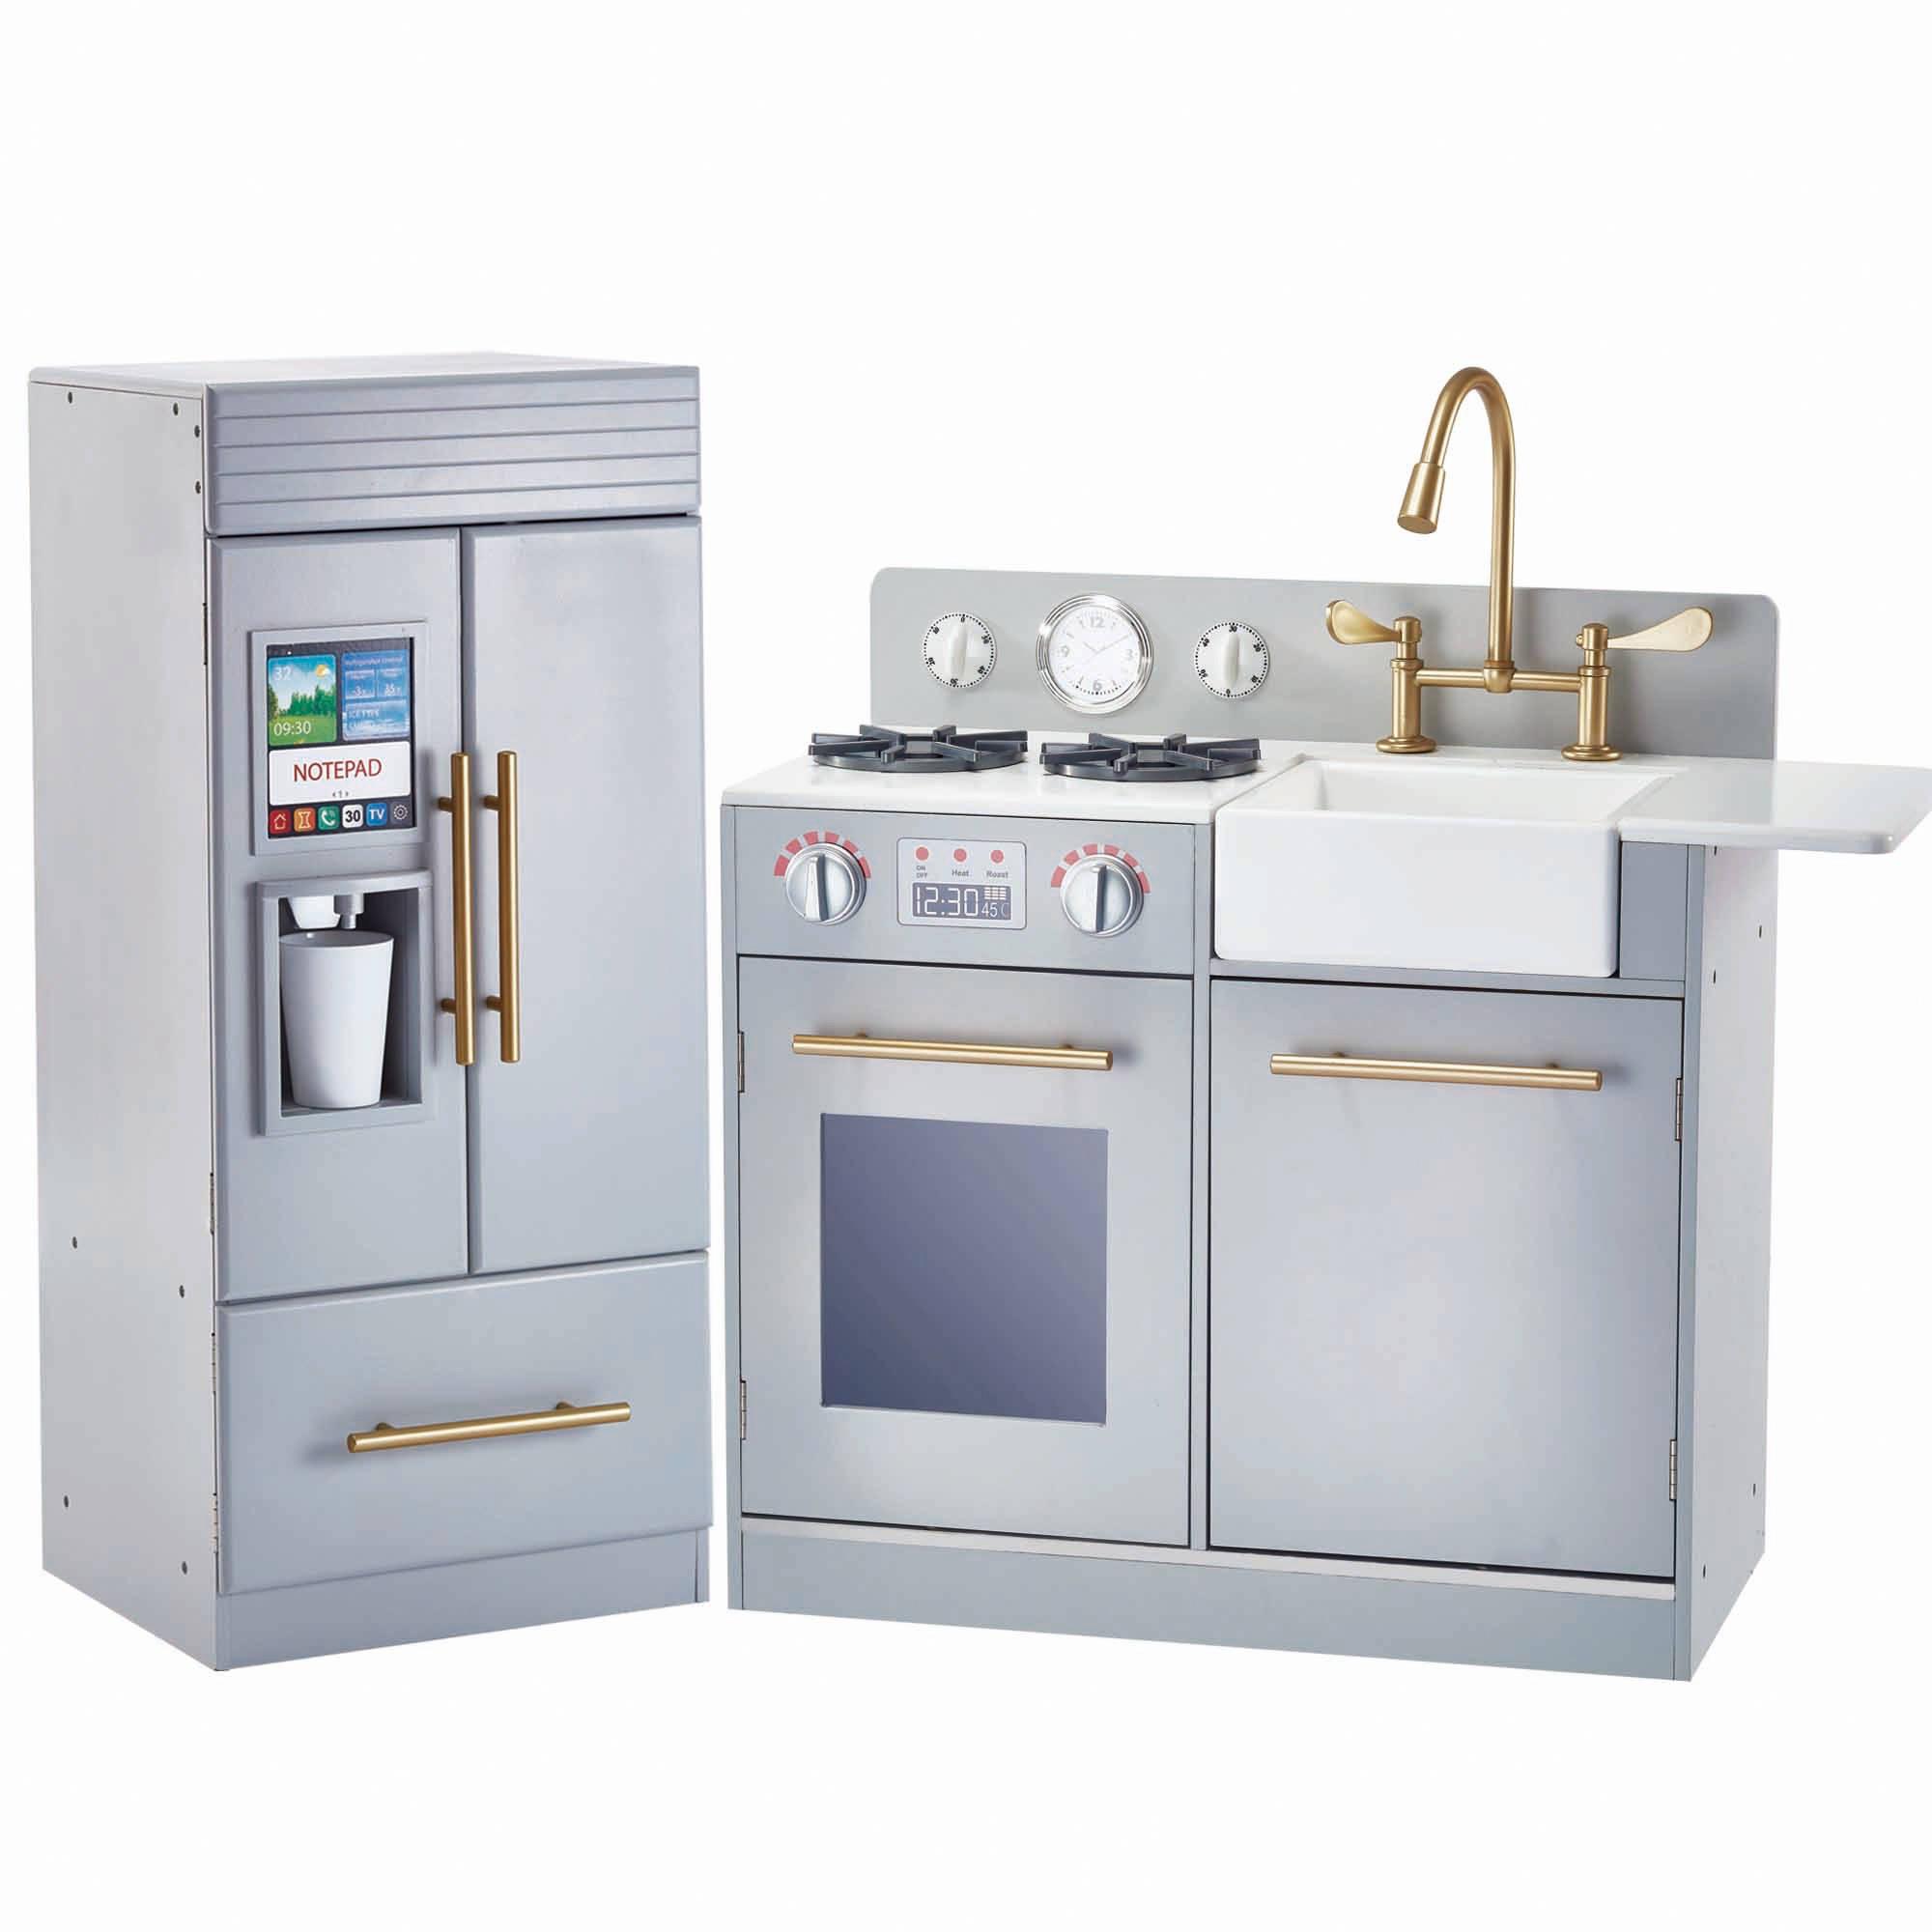 kid kitchens vintage kitchen decor kids sets teamson little chef chelsea modern play silver grey